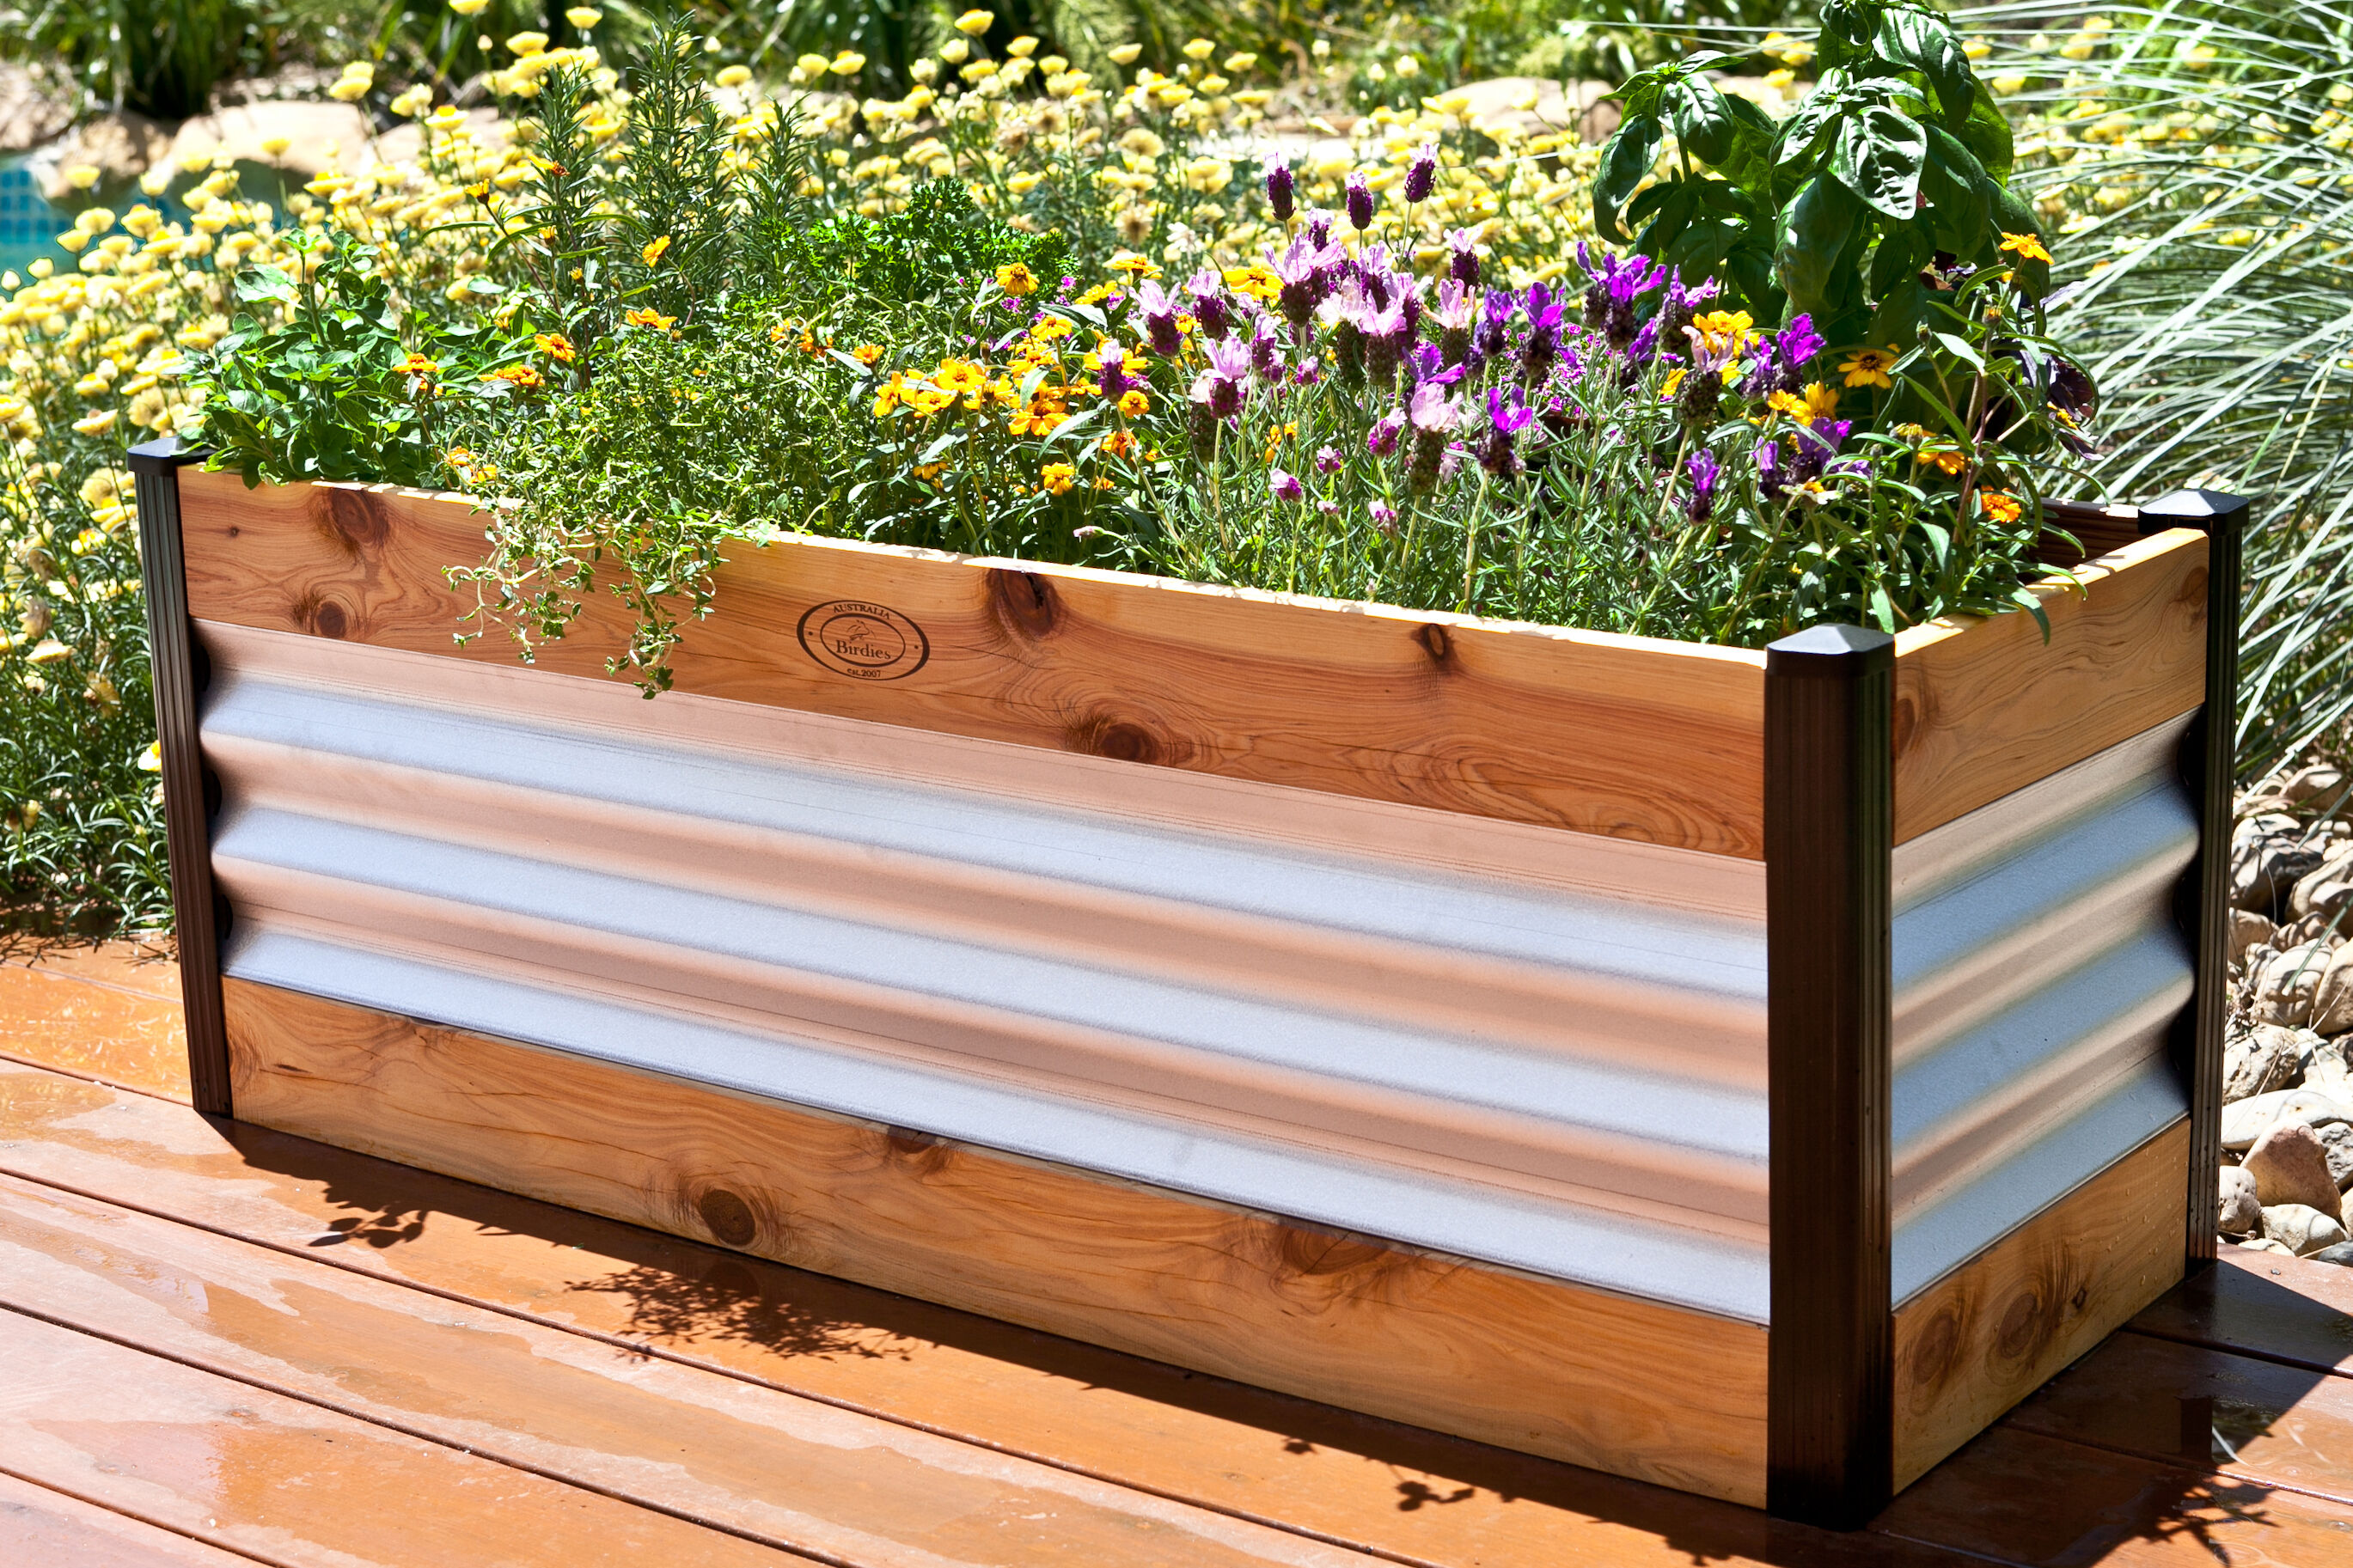 North Melbourne Corrugated Metal Raised Garden Beds Gets Modern Addition